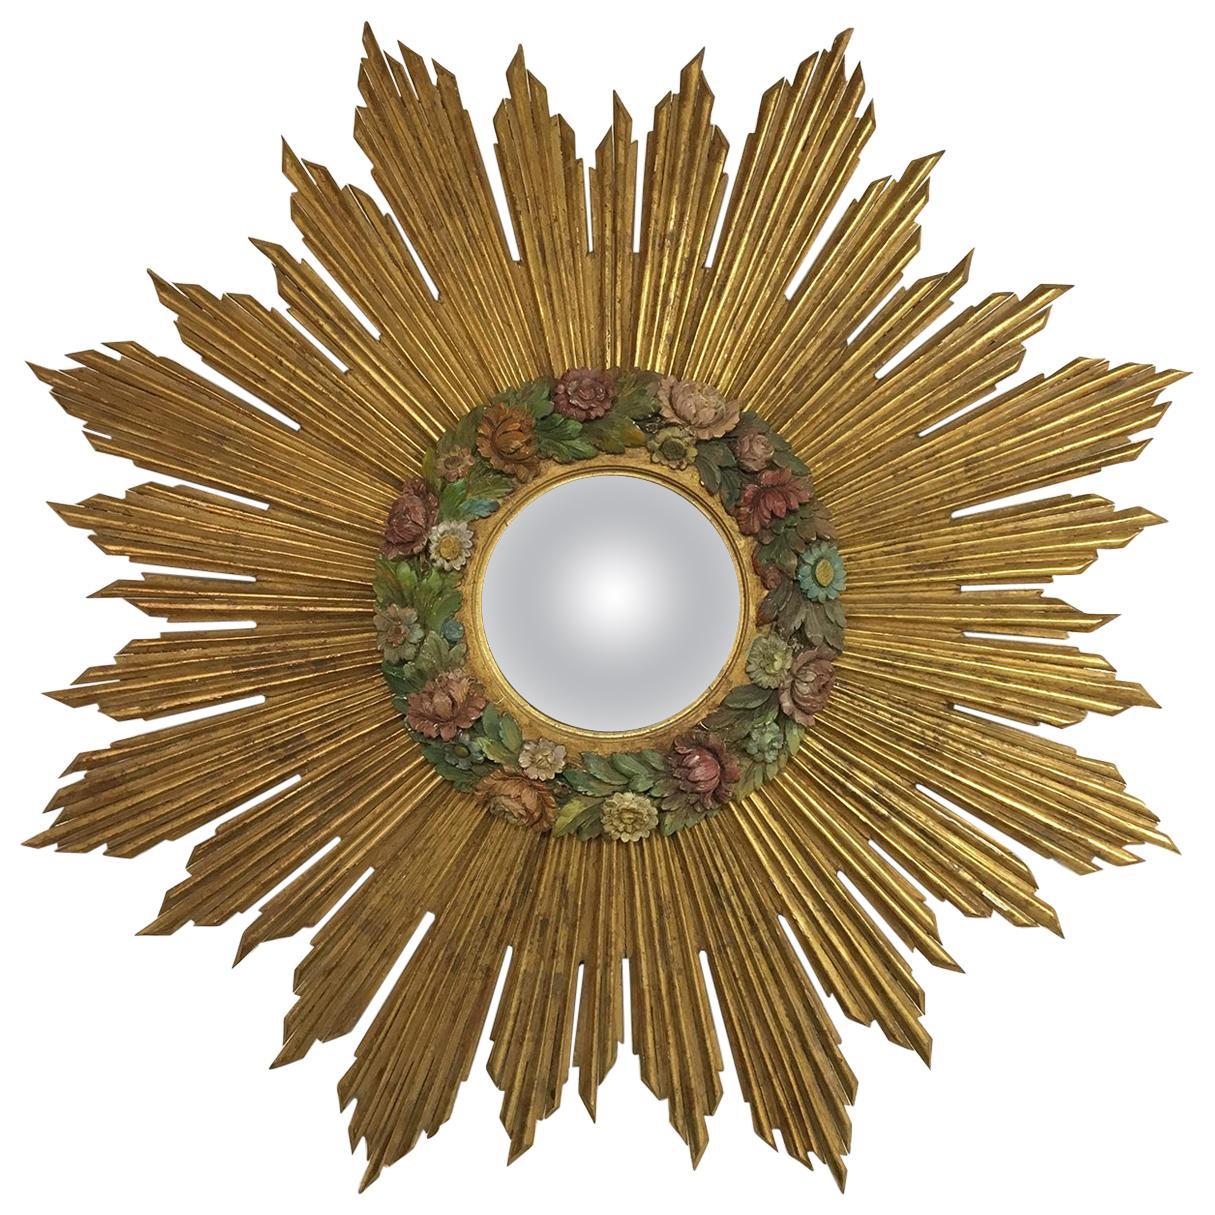 Antique Gold Sunburst Starburst Giltwood French Convex Gilded Barbola Mirror